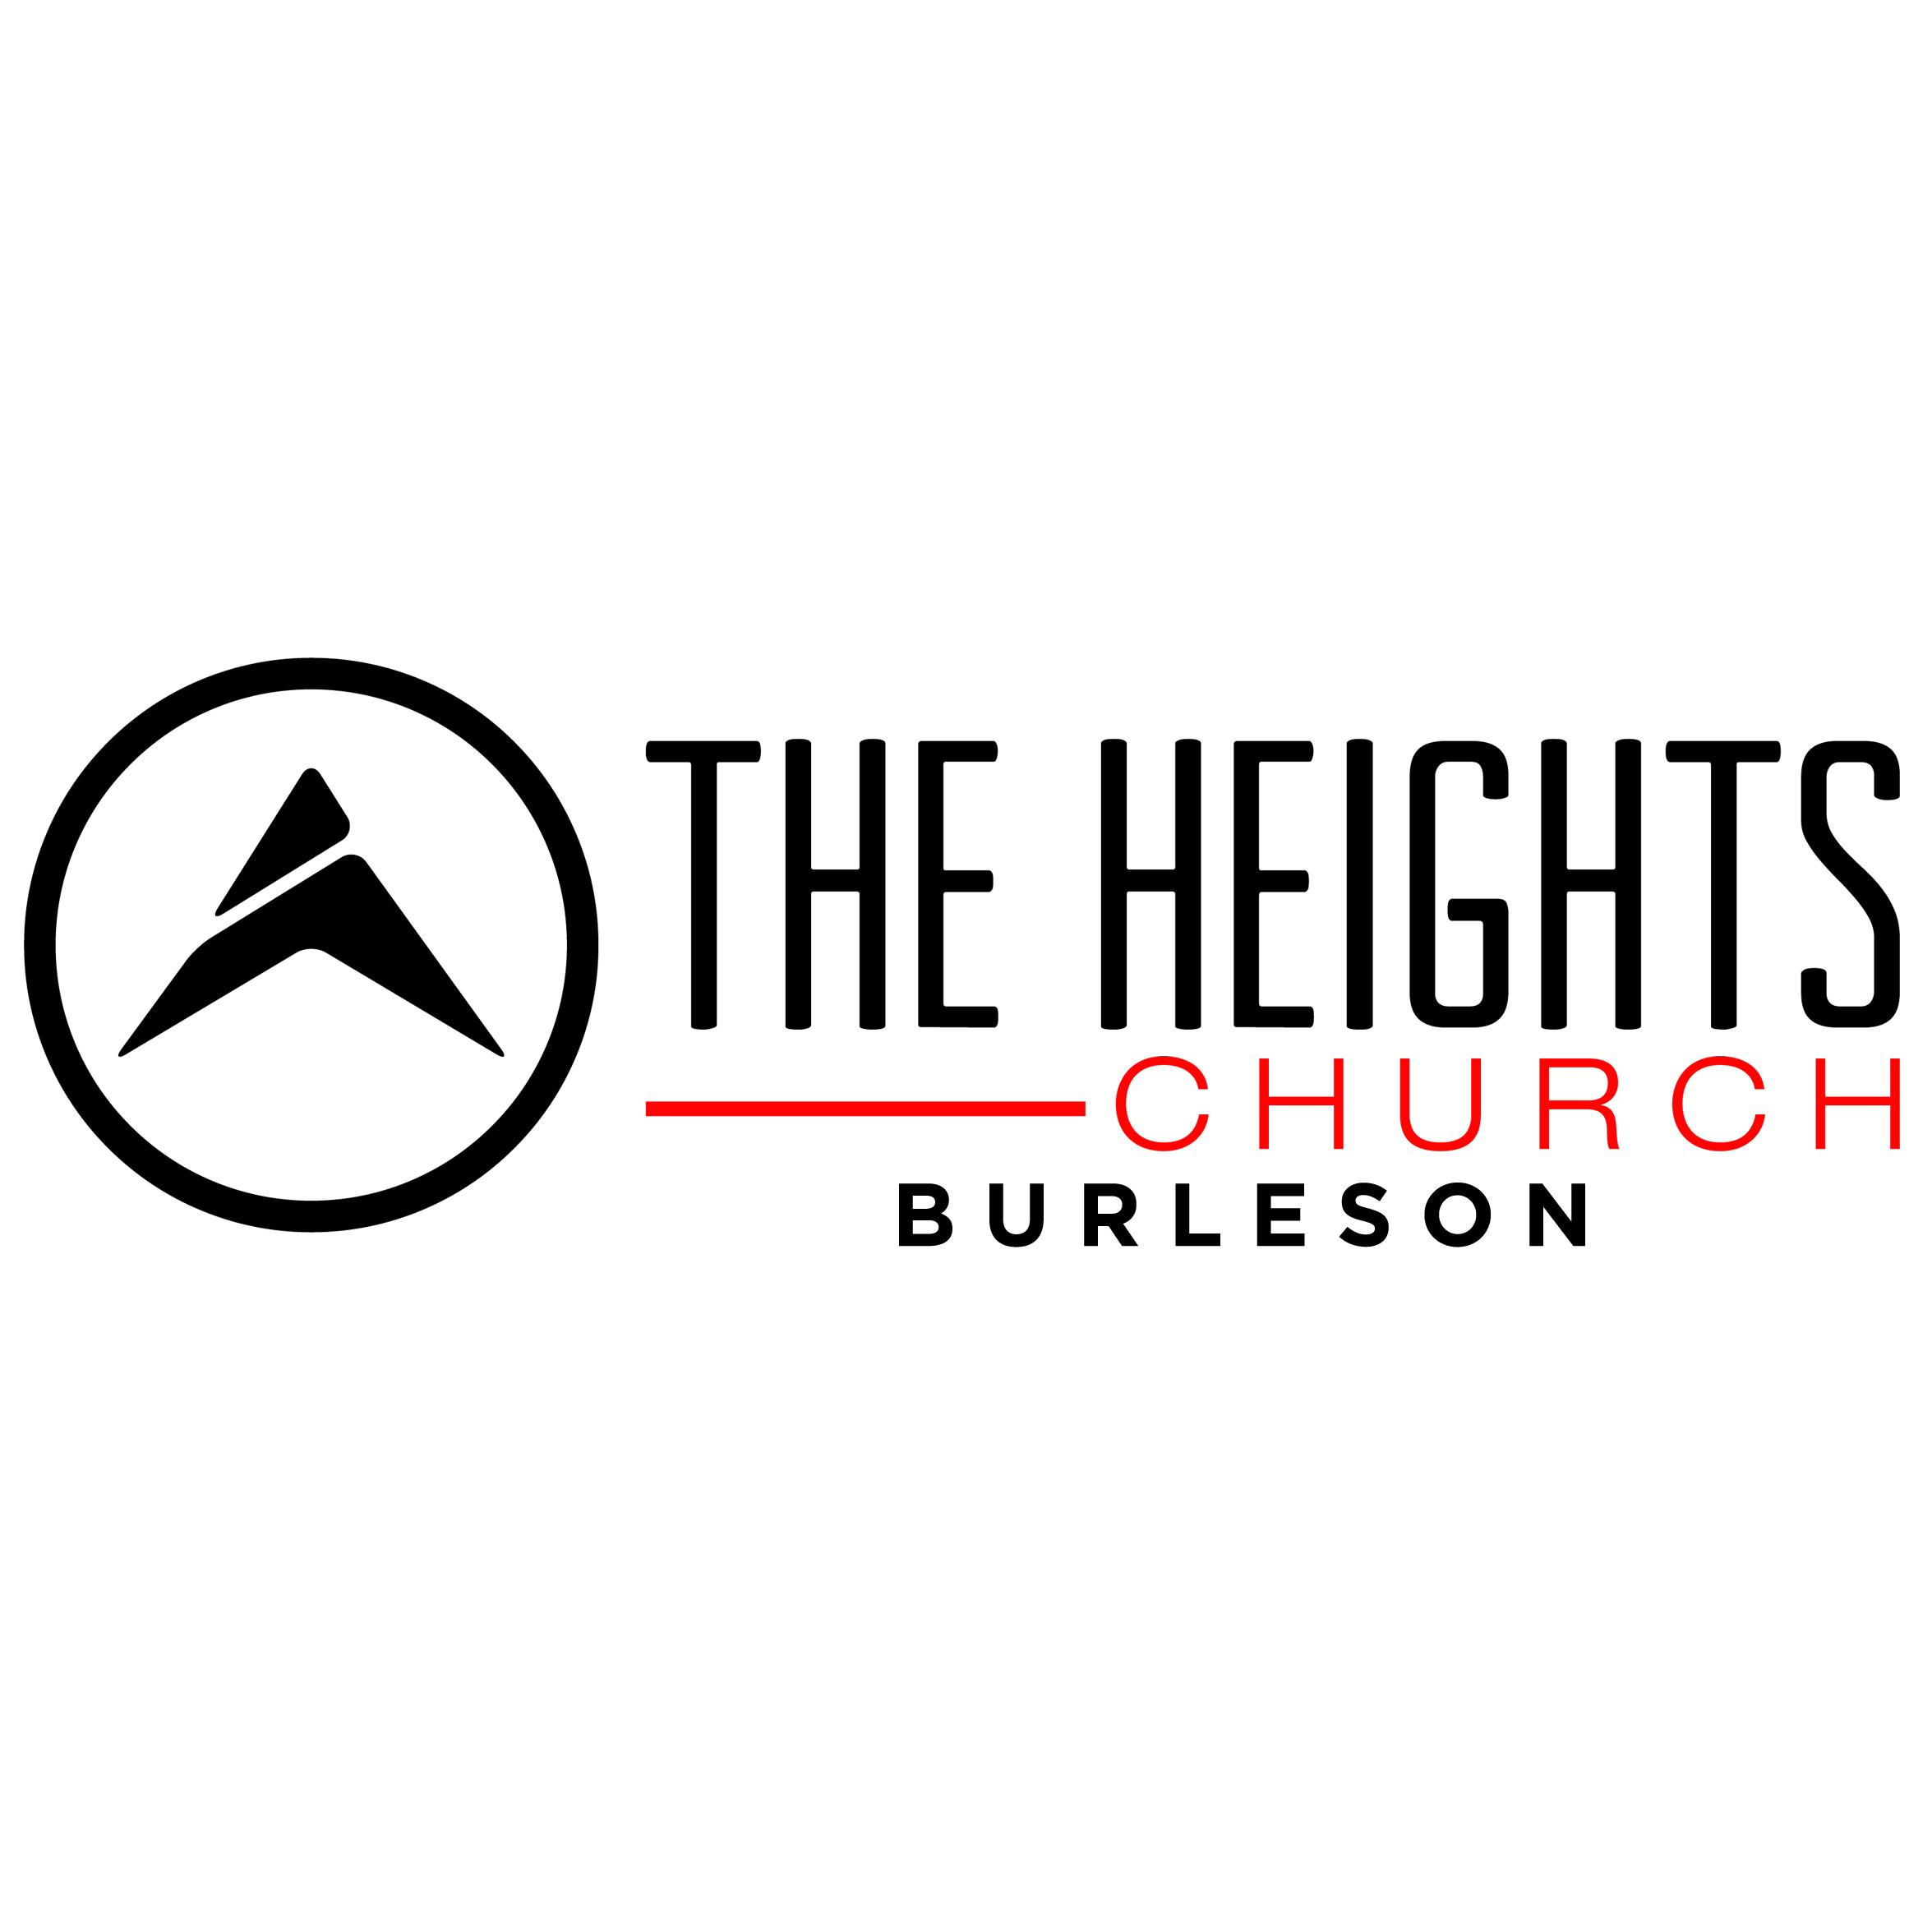 The Heights Church Burleson